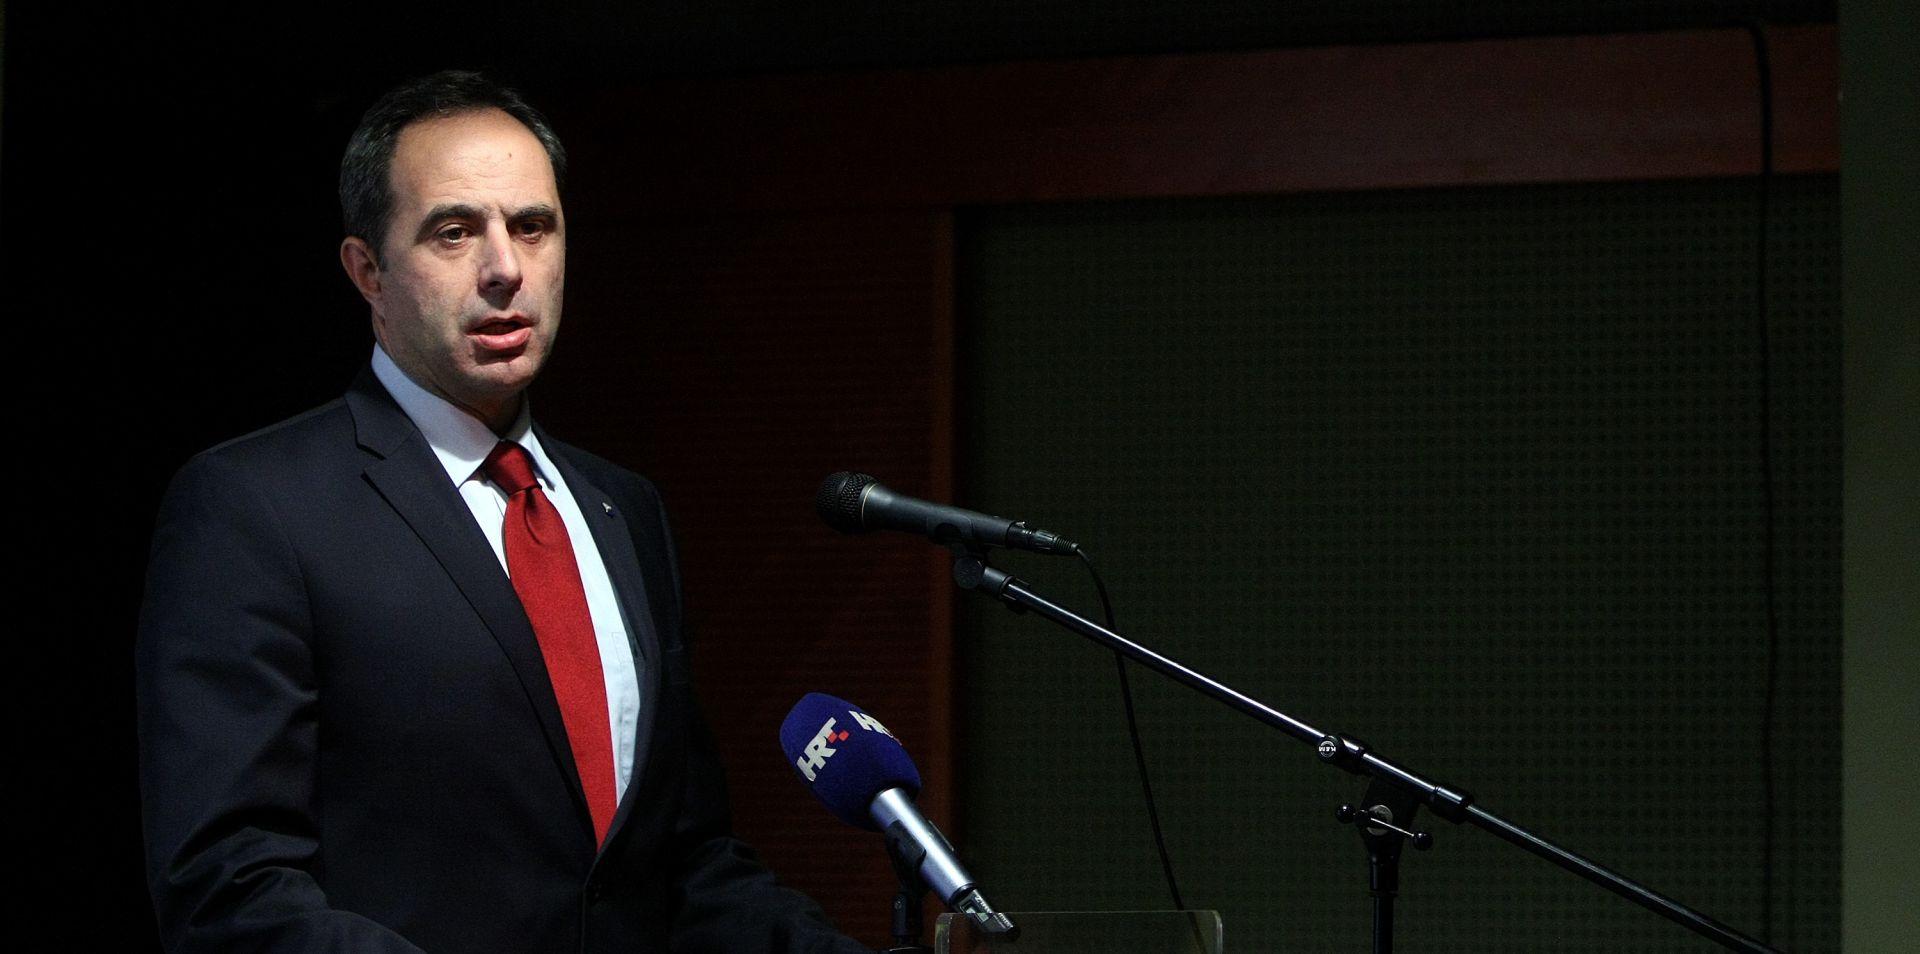 DANIEL SRB 'Pero Ćorić je jamac Milanovićeva povratka na vlast'